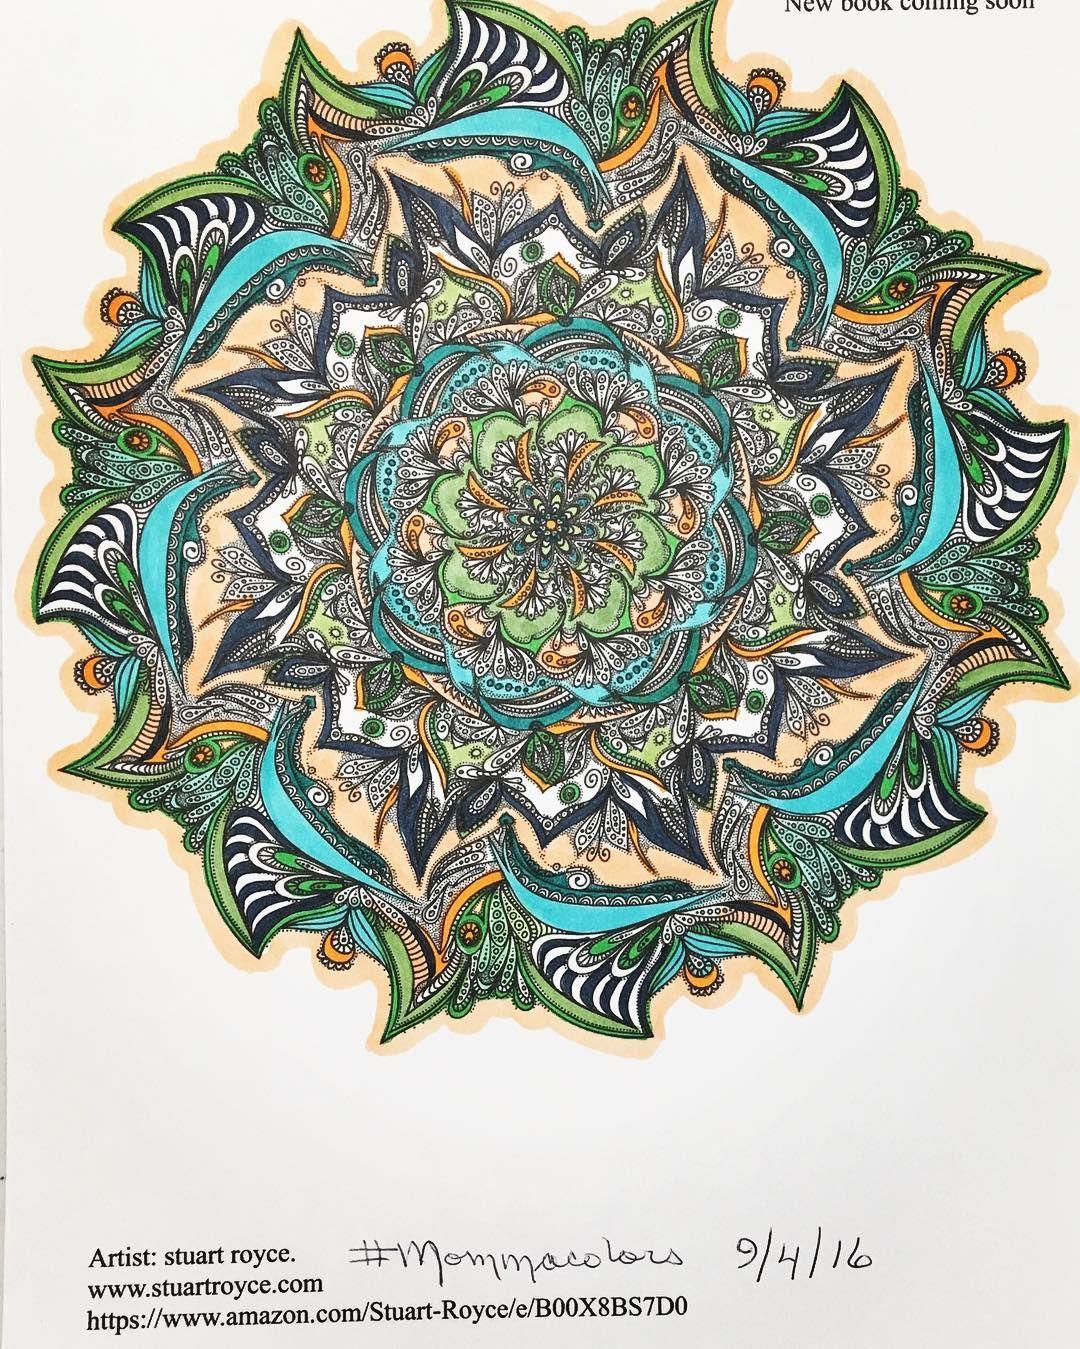 Pin by Bill Holmes on Stuart Royce Mandalas | Royce, Mandala ...